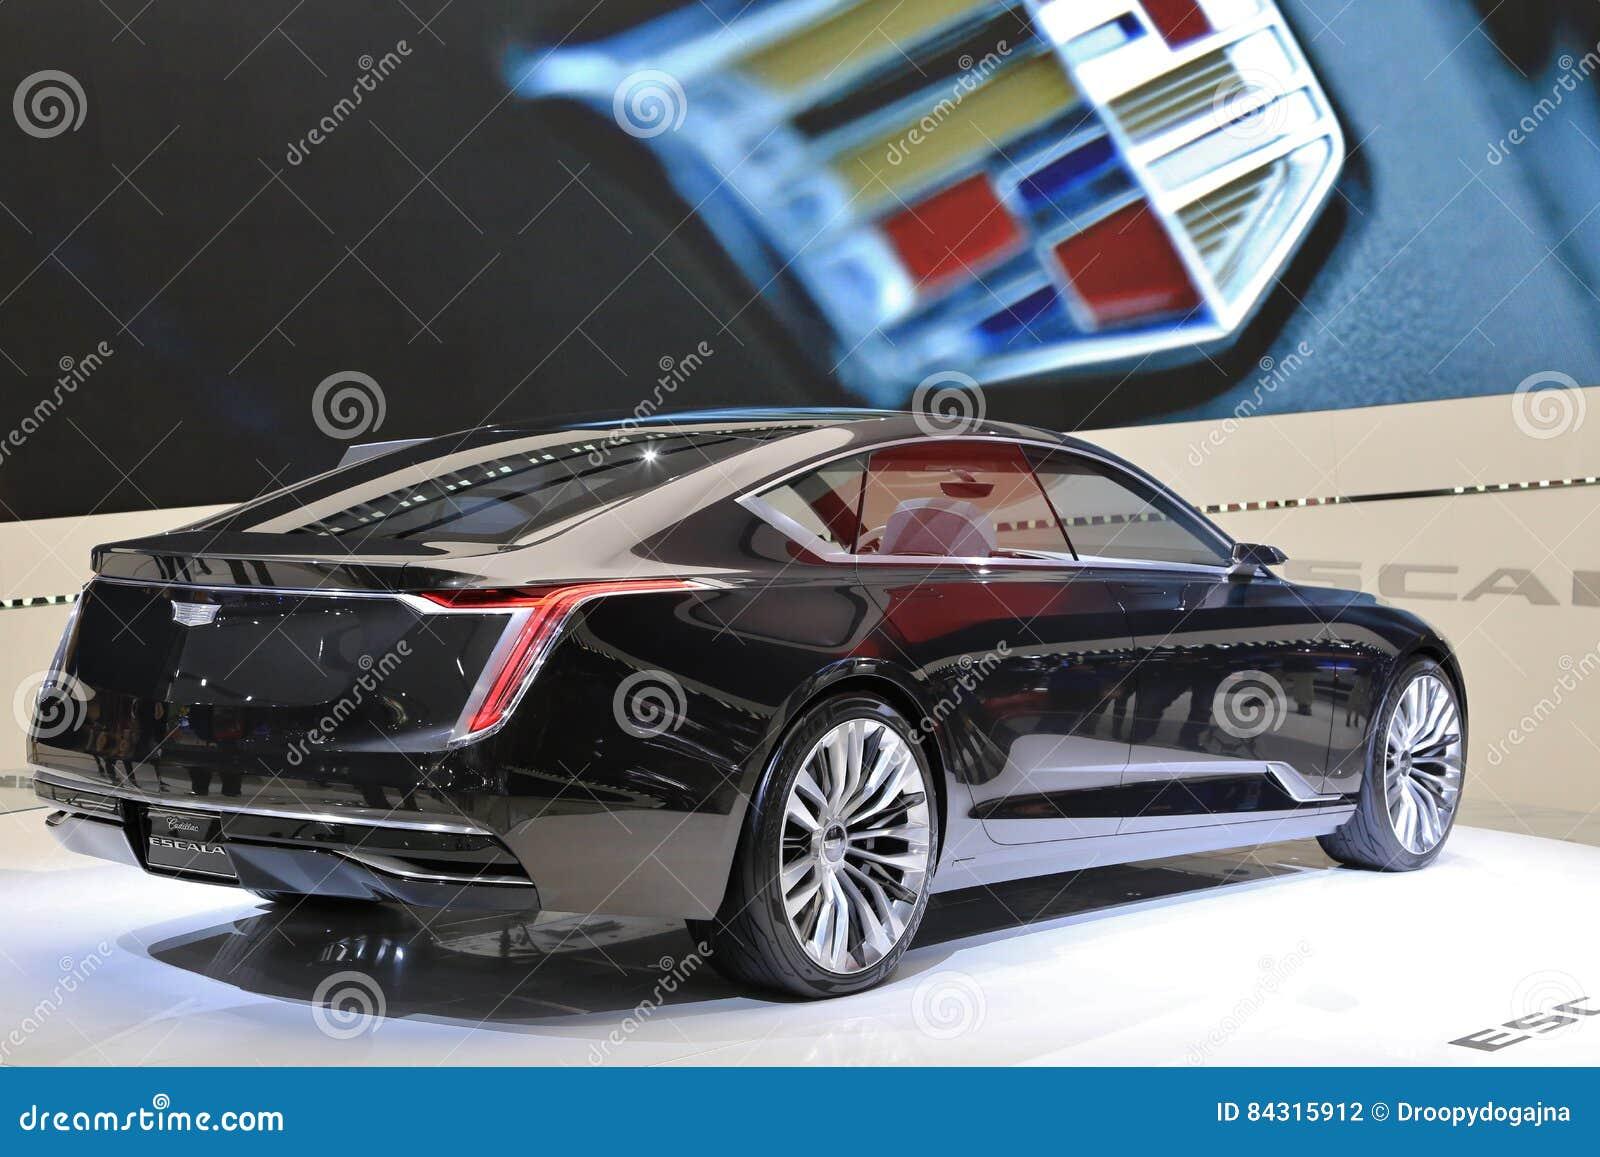 New Vehicles 2017 >> Cadillac On Display At The 2017 North American International